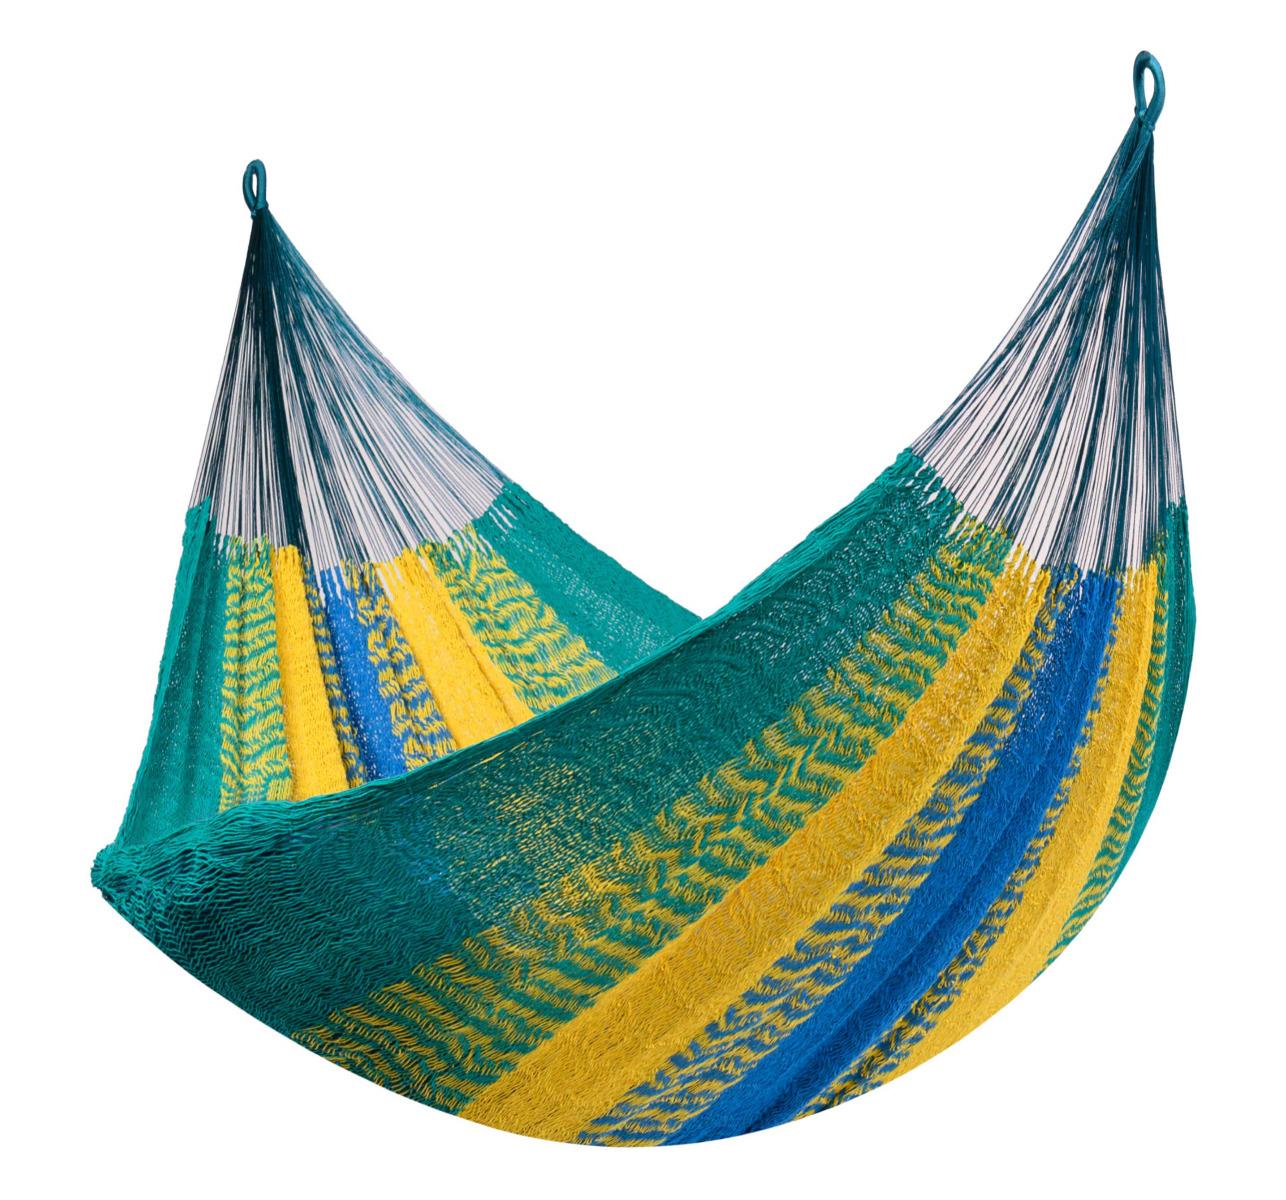 Hangmat Familie 'Cacun' Tropical - Veelkleurig - Tropilex ®